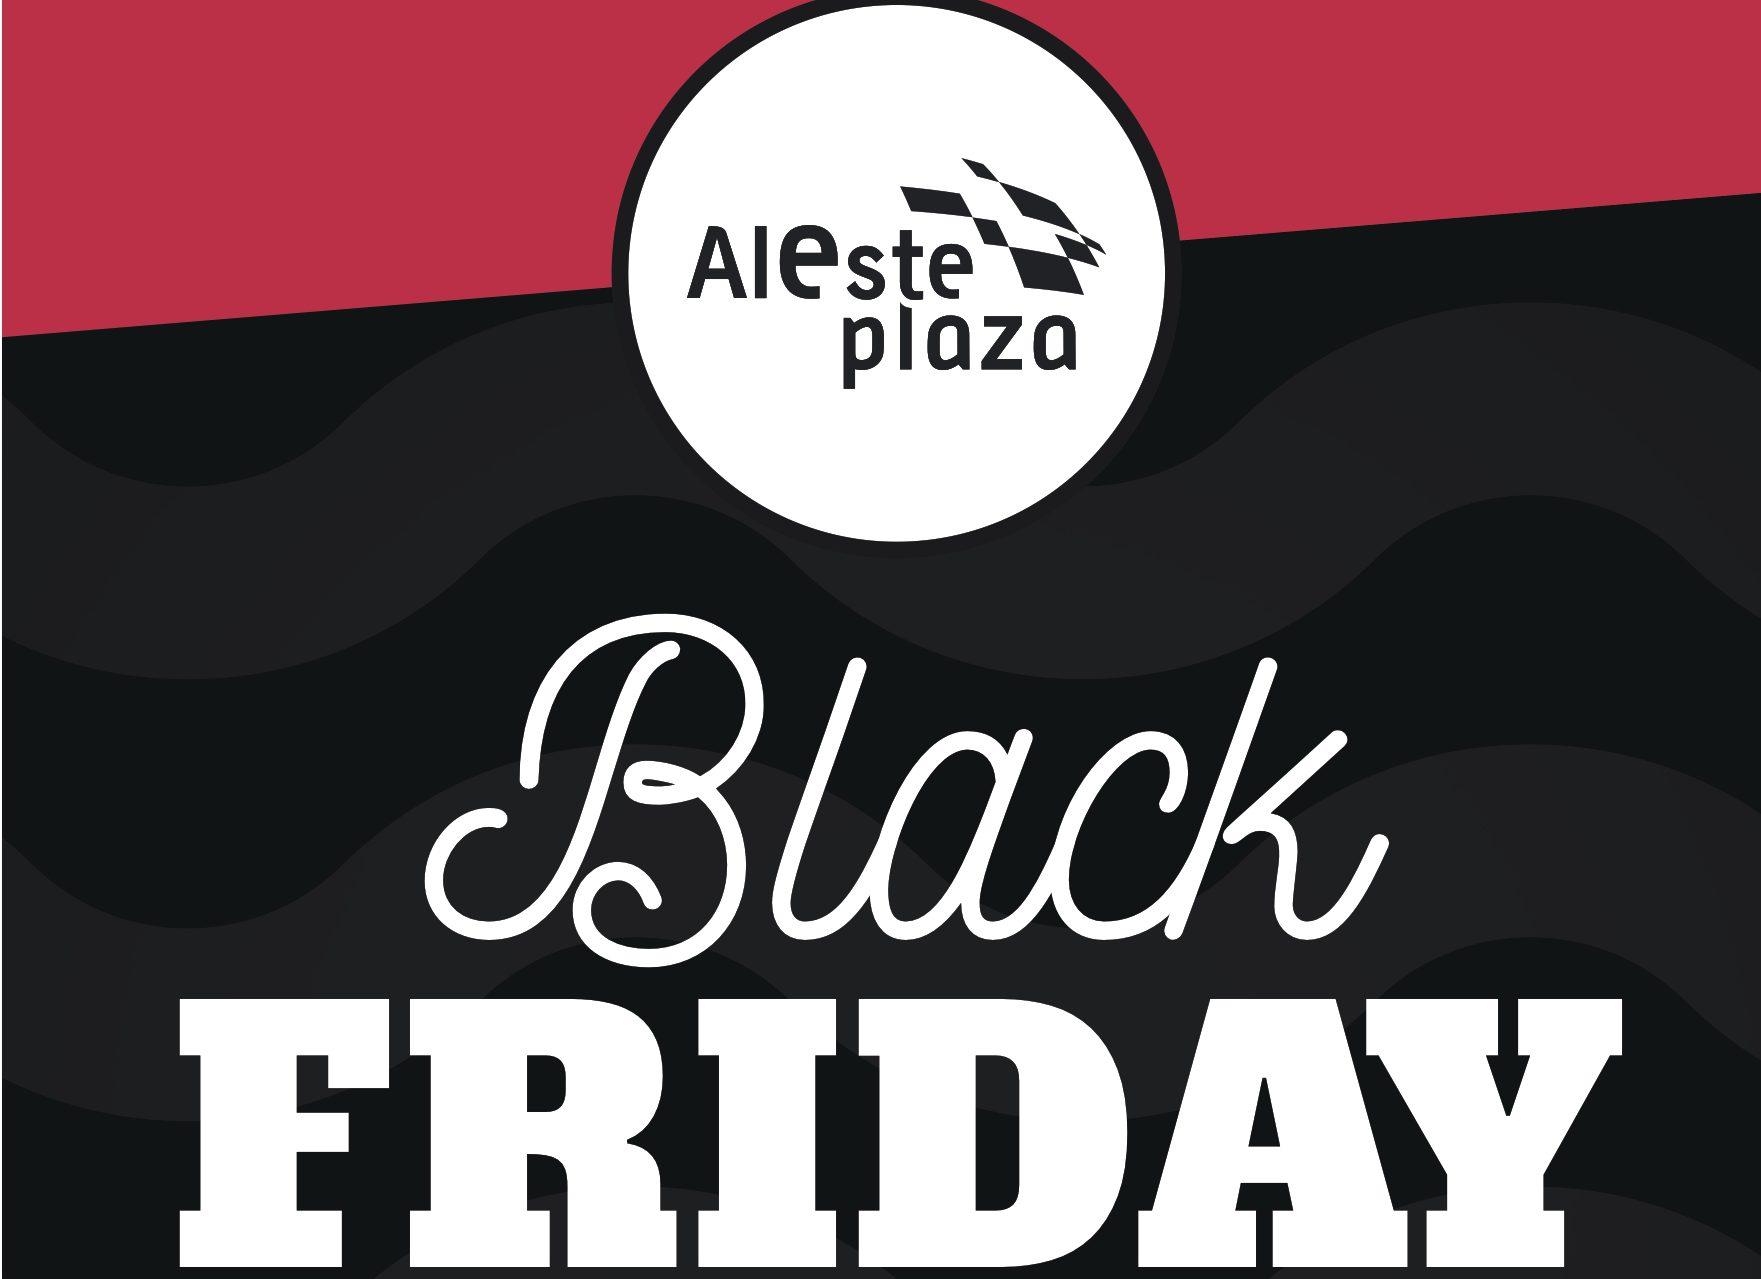 cartel black friday aleste plaza 2017